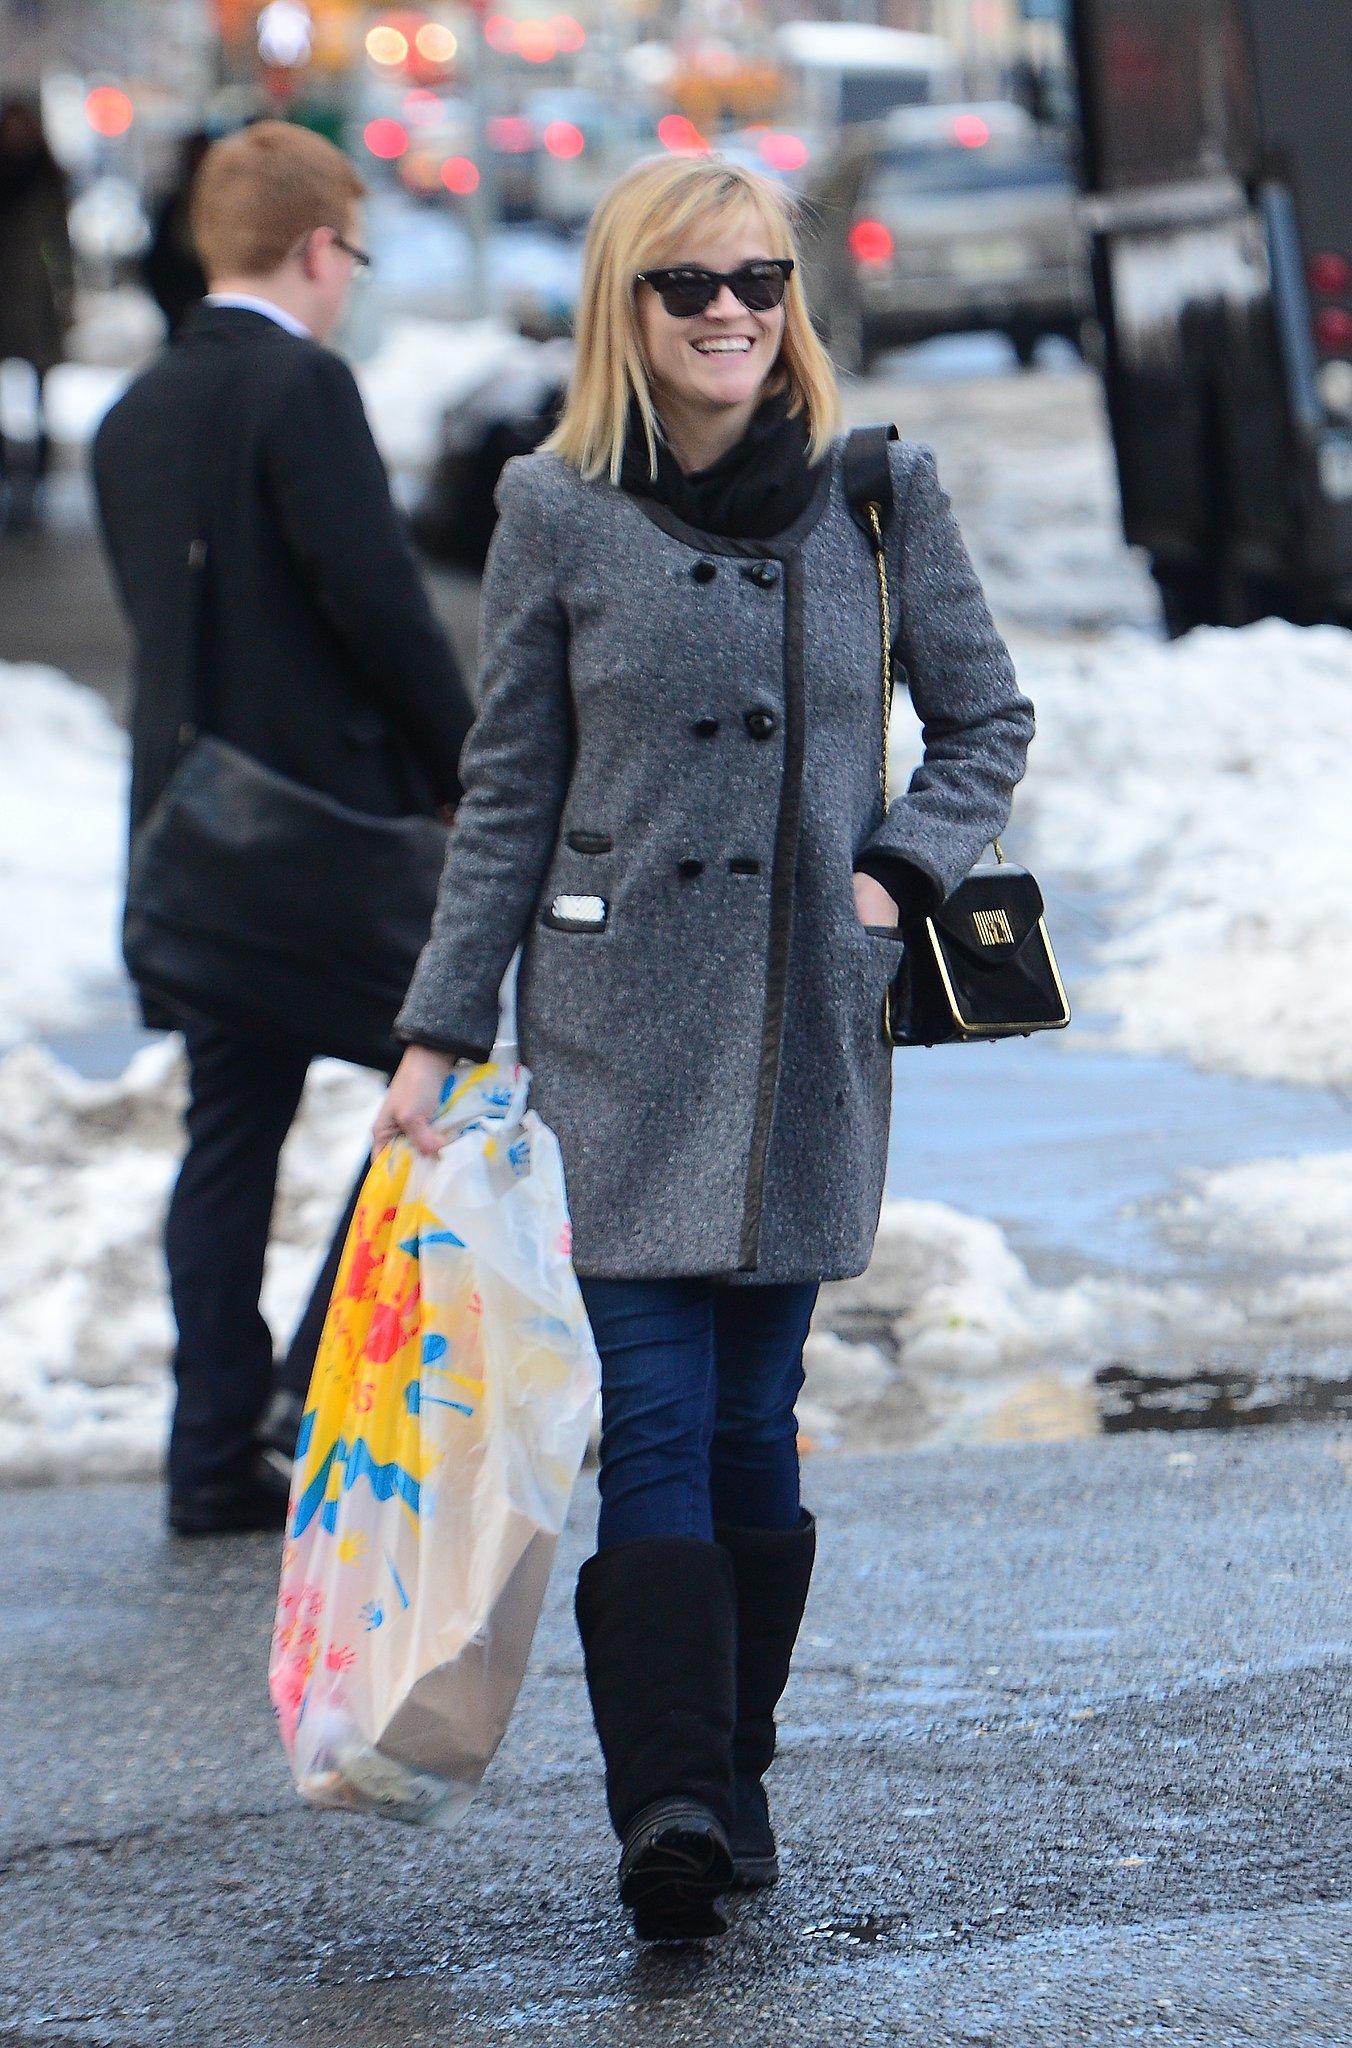 Reese Witherspoon in Tweed Coat